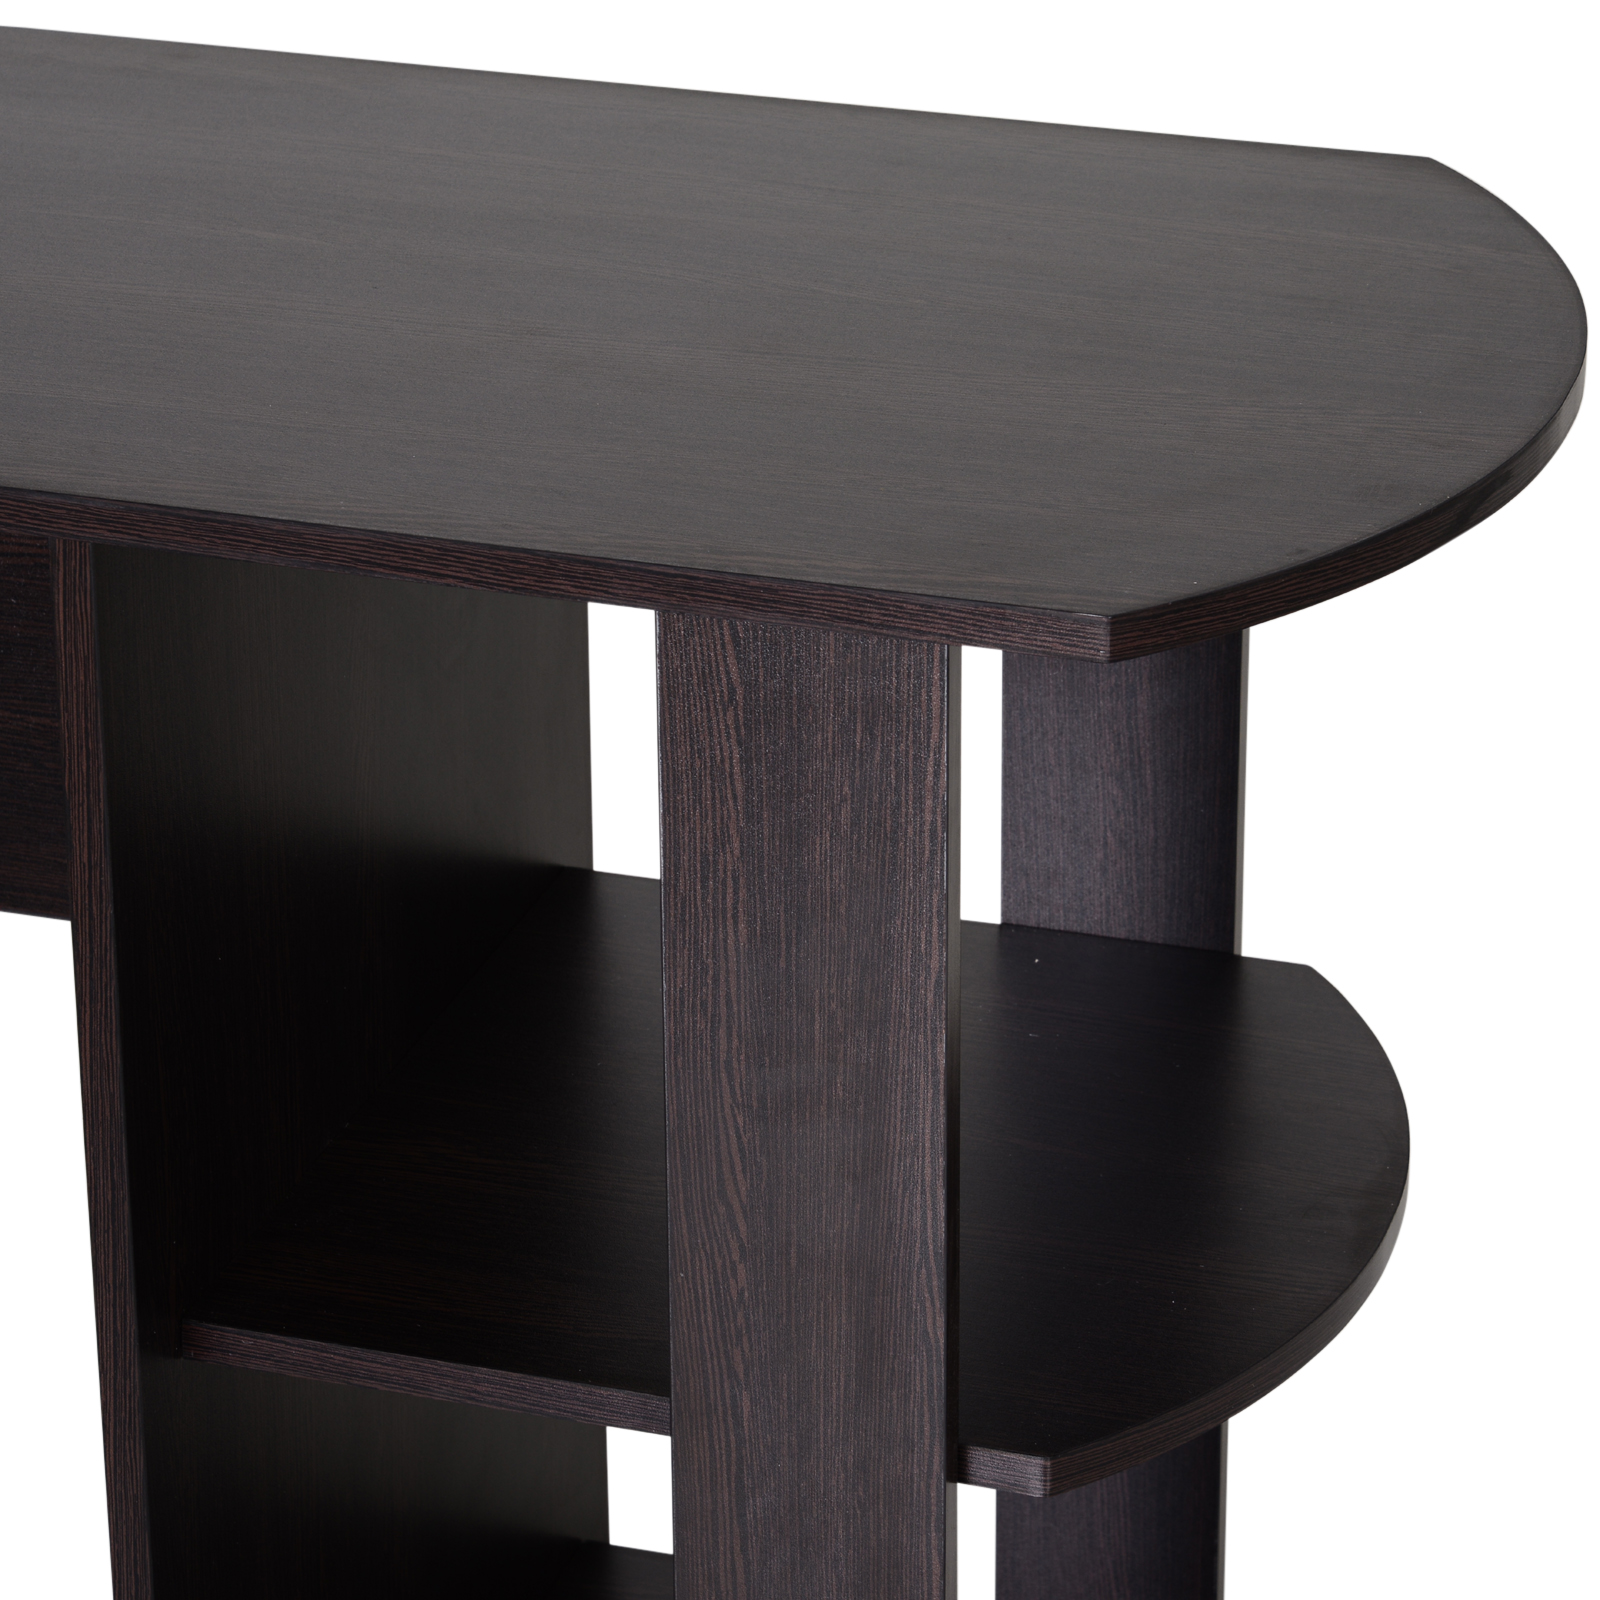 Mesa-de-Ordenador-PC-Escritorio-para-Oficina-Hogar-Esquinera-Forma-L-Madera miniatura 10